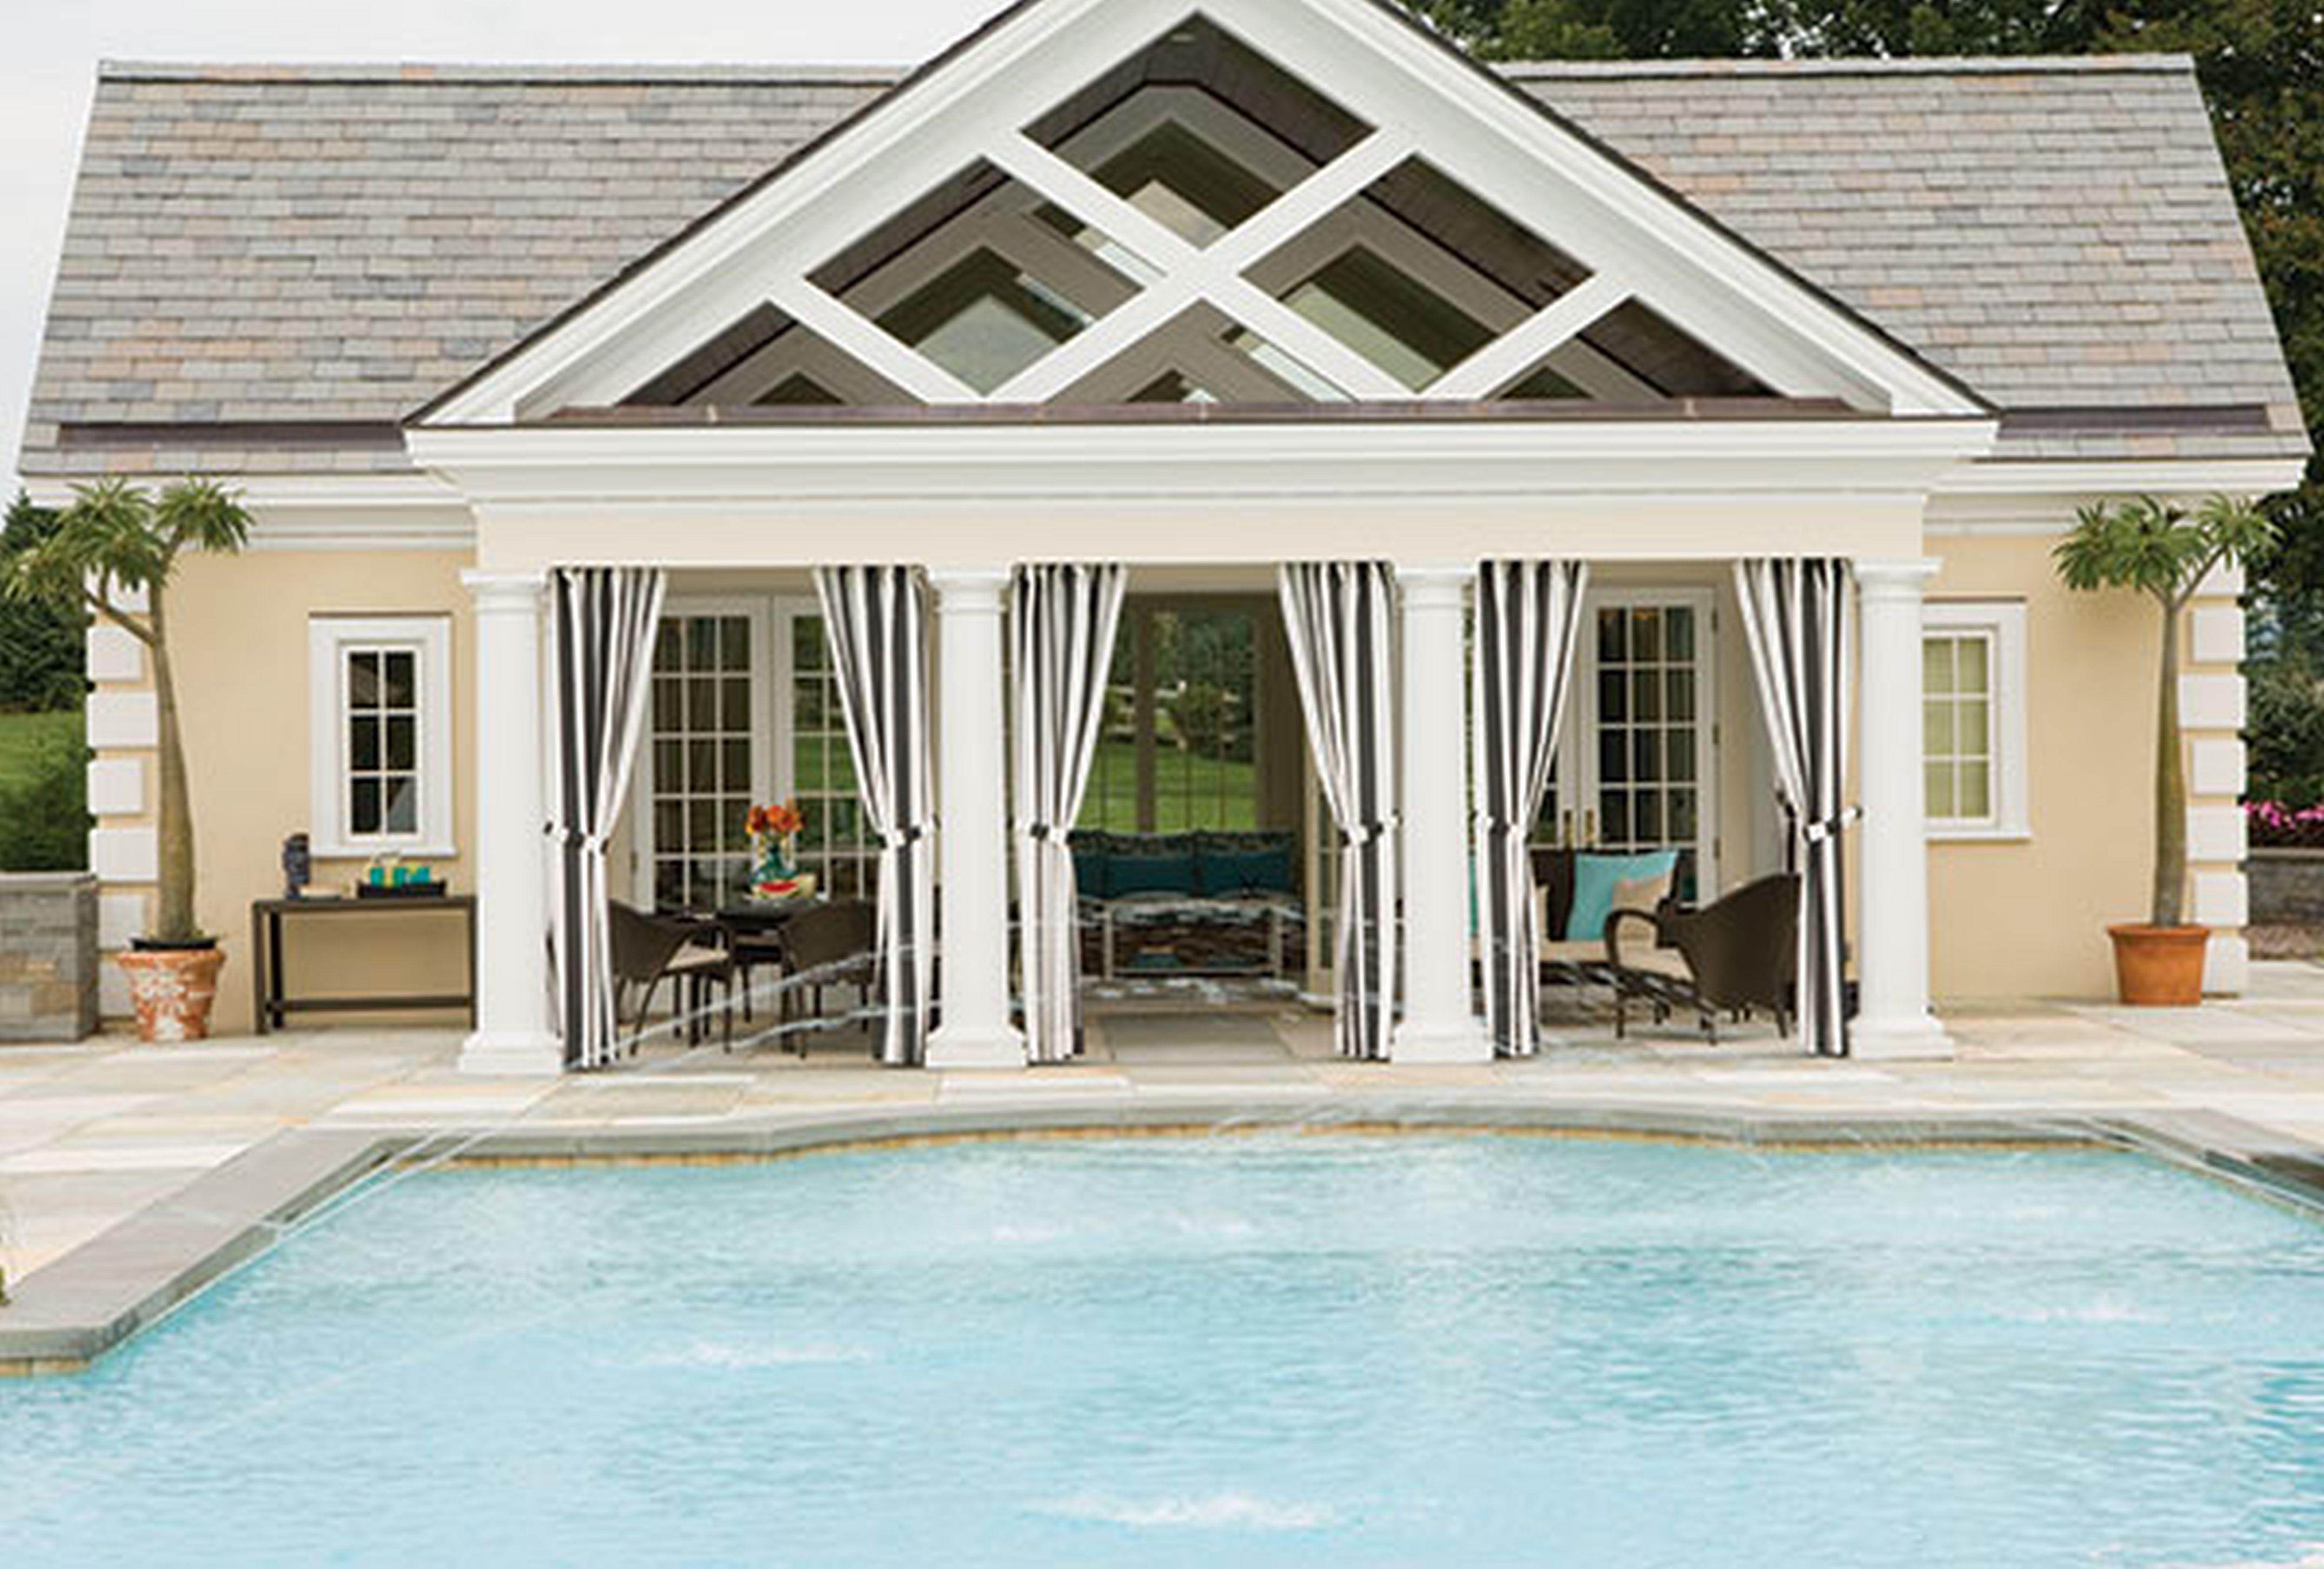 Small Pool House Design Ideas POOL HOUSE Pinterest Pool